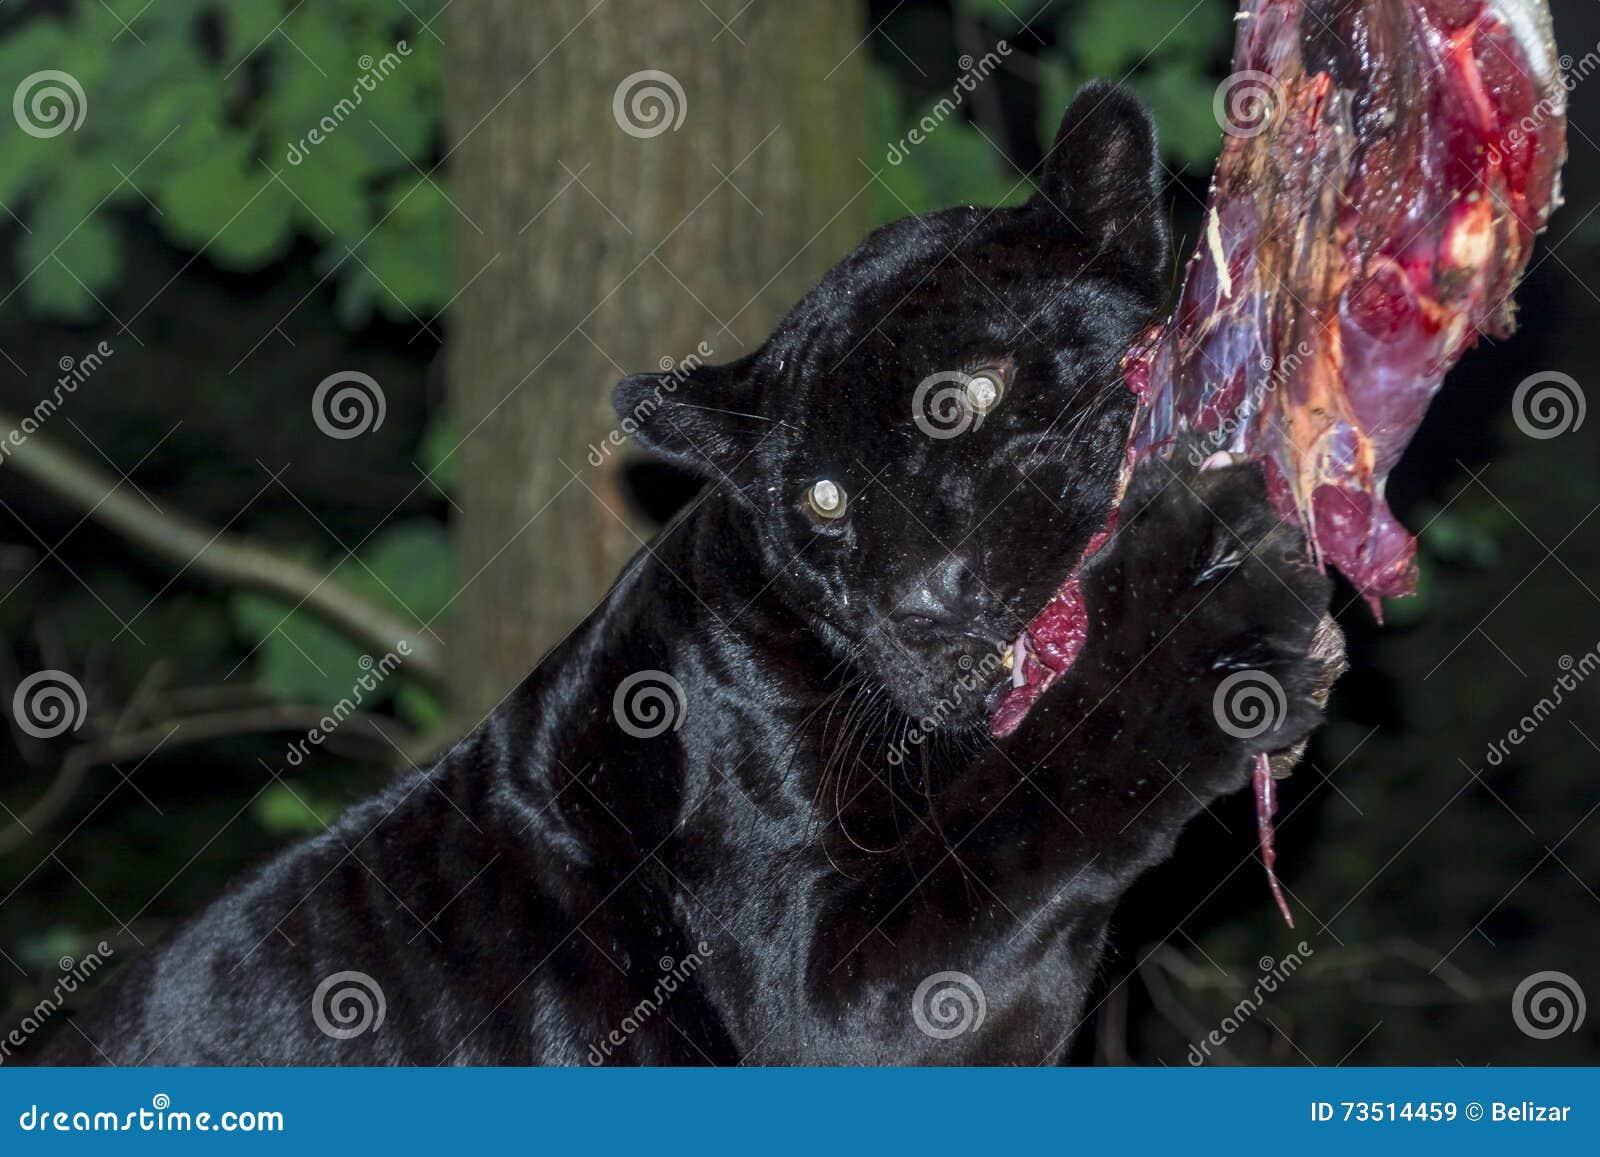 black jaguar lunch stock image image of pantherinae 73514459